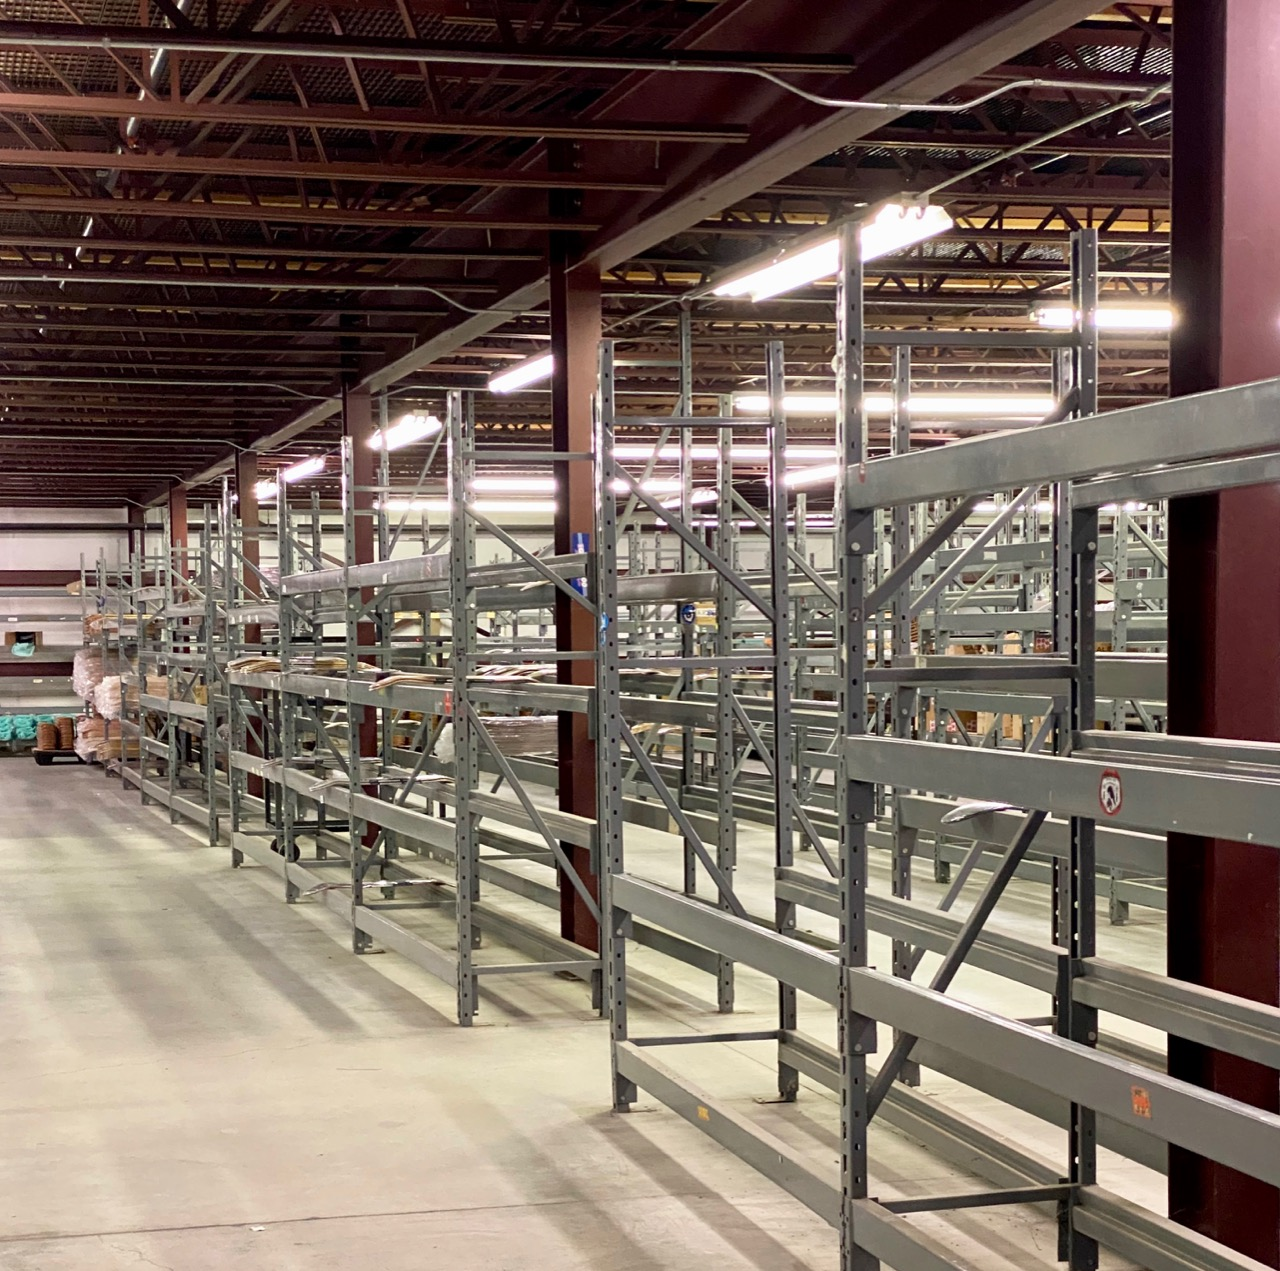 easternSkate warehouse